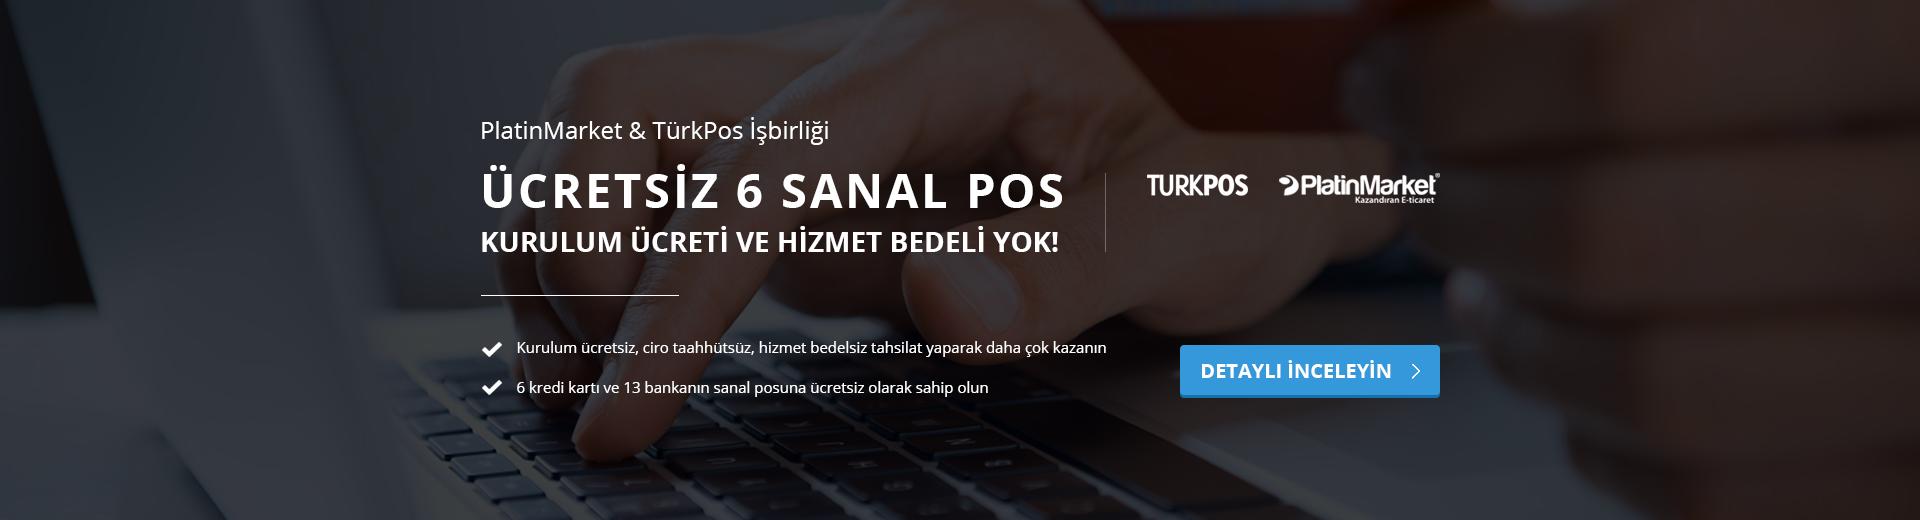 banner-turkpos-1